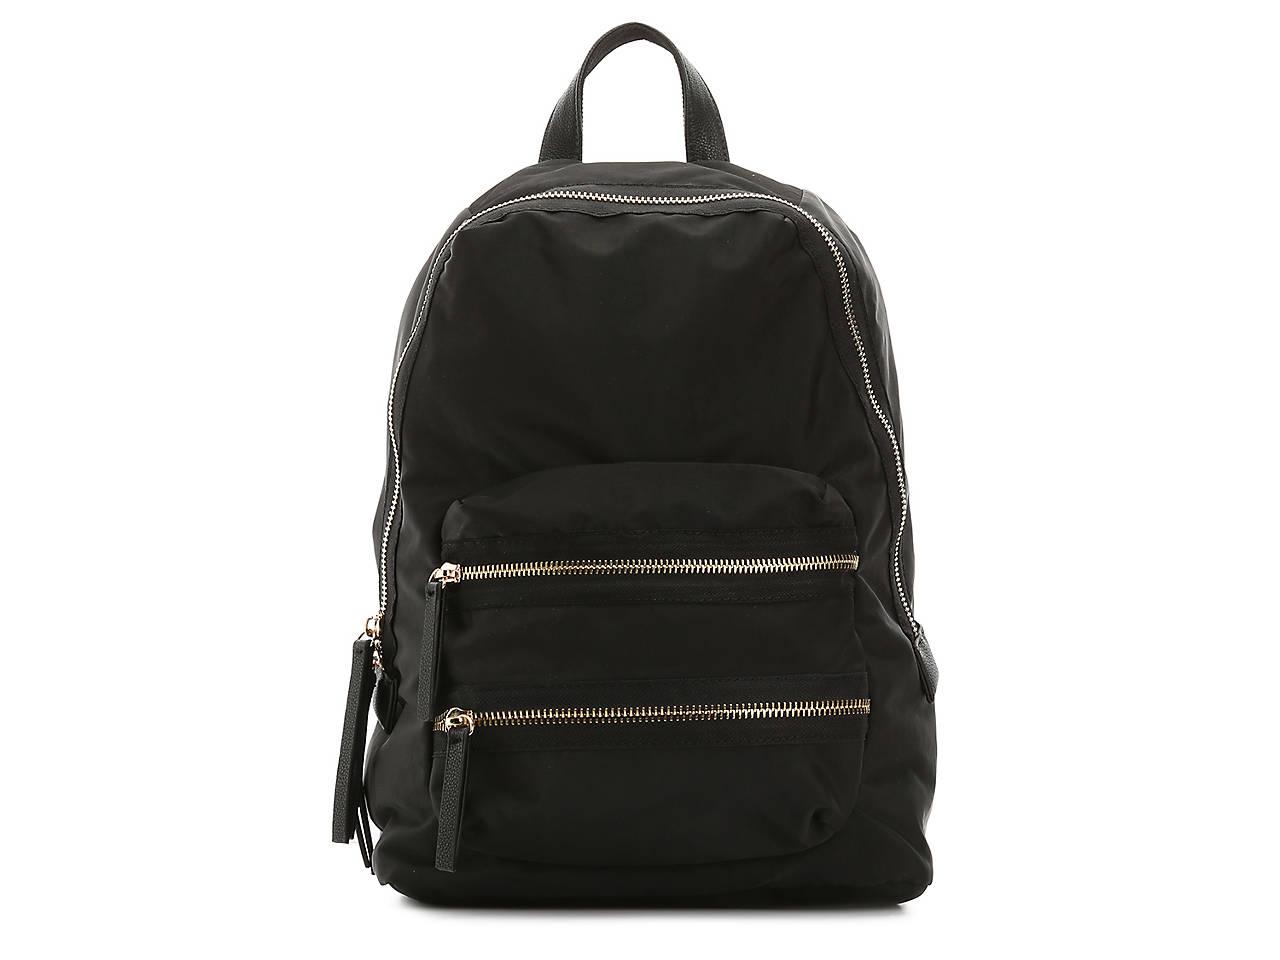 e14c9e2f9d Madison West Nylon Backpack Women s Handbags   Accessories